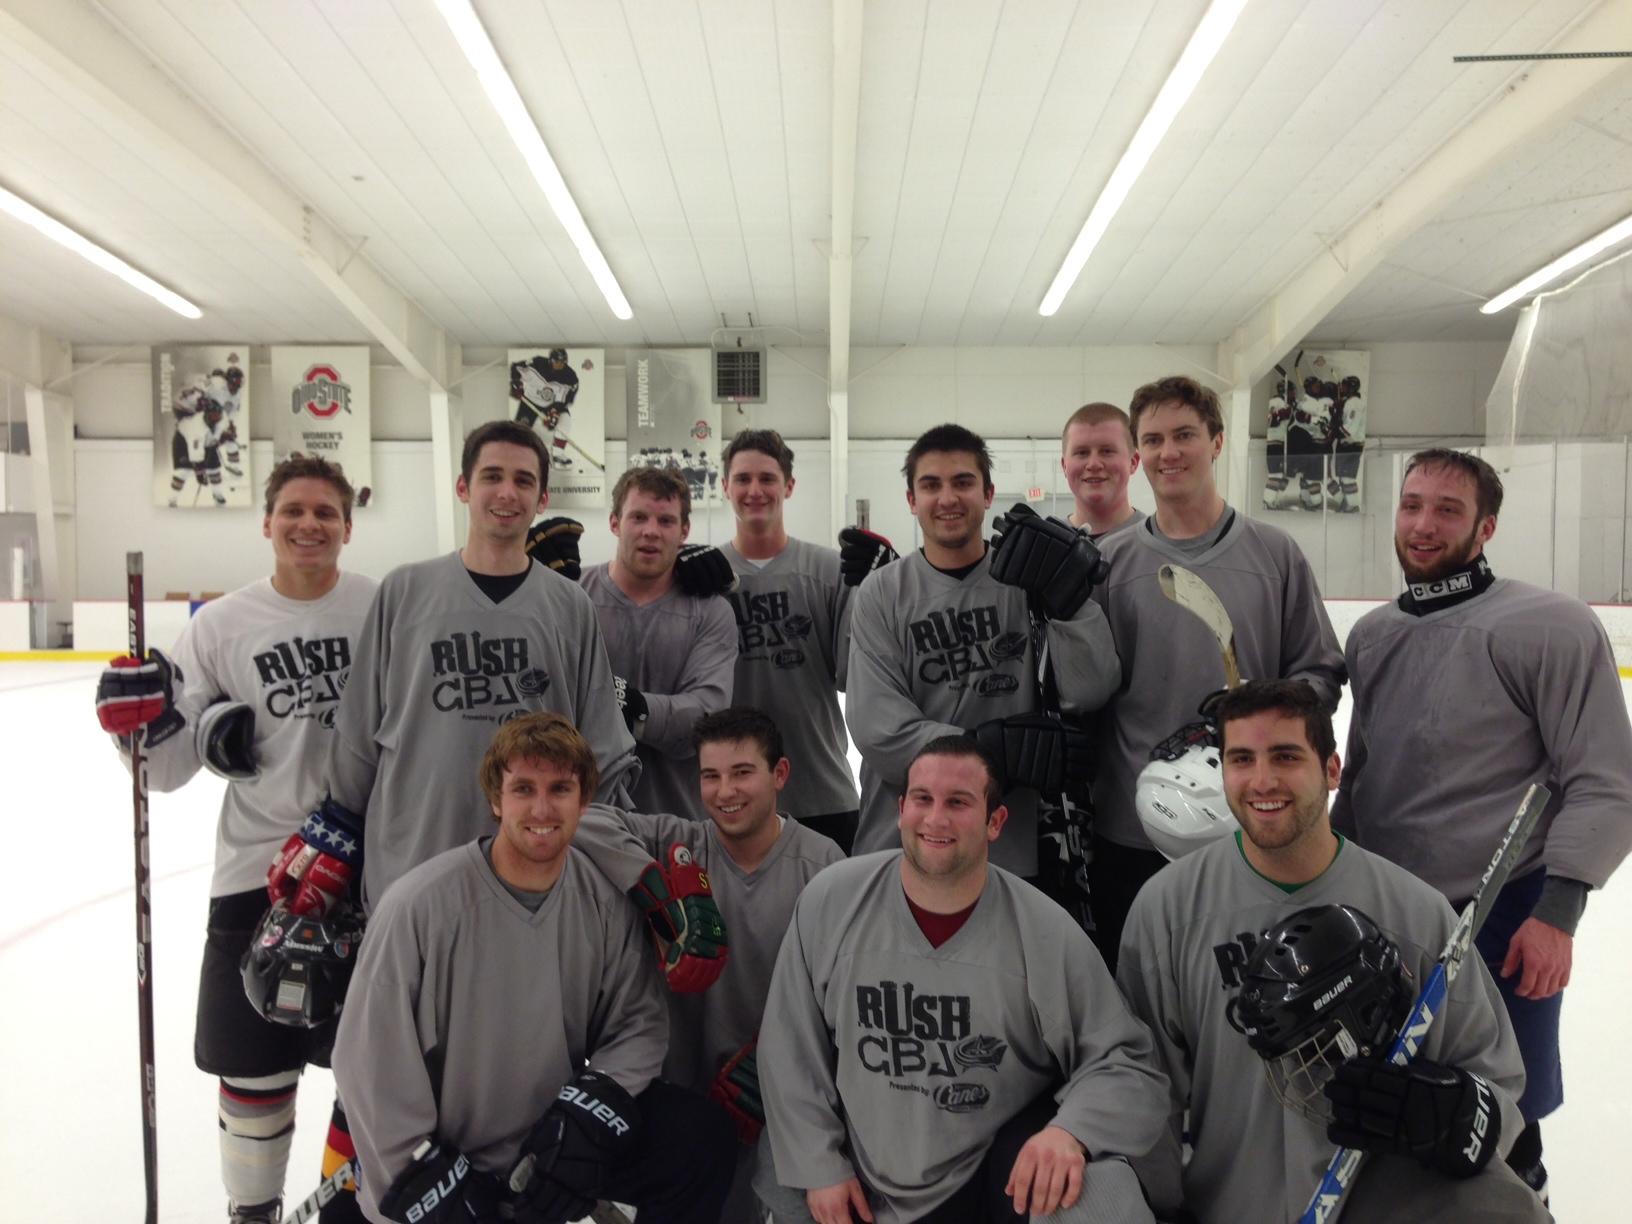 ATΩ's KD slapshot hockey team